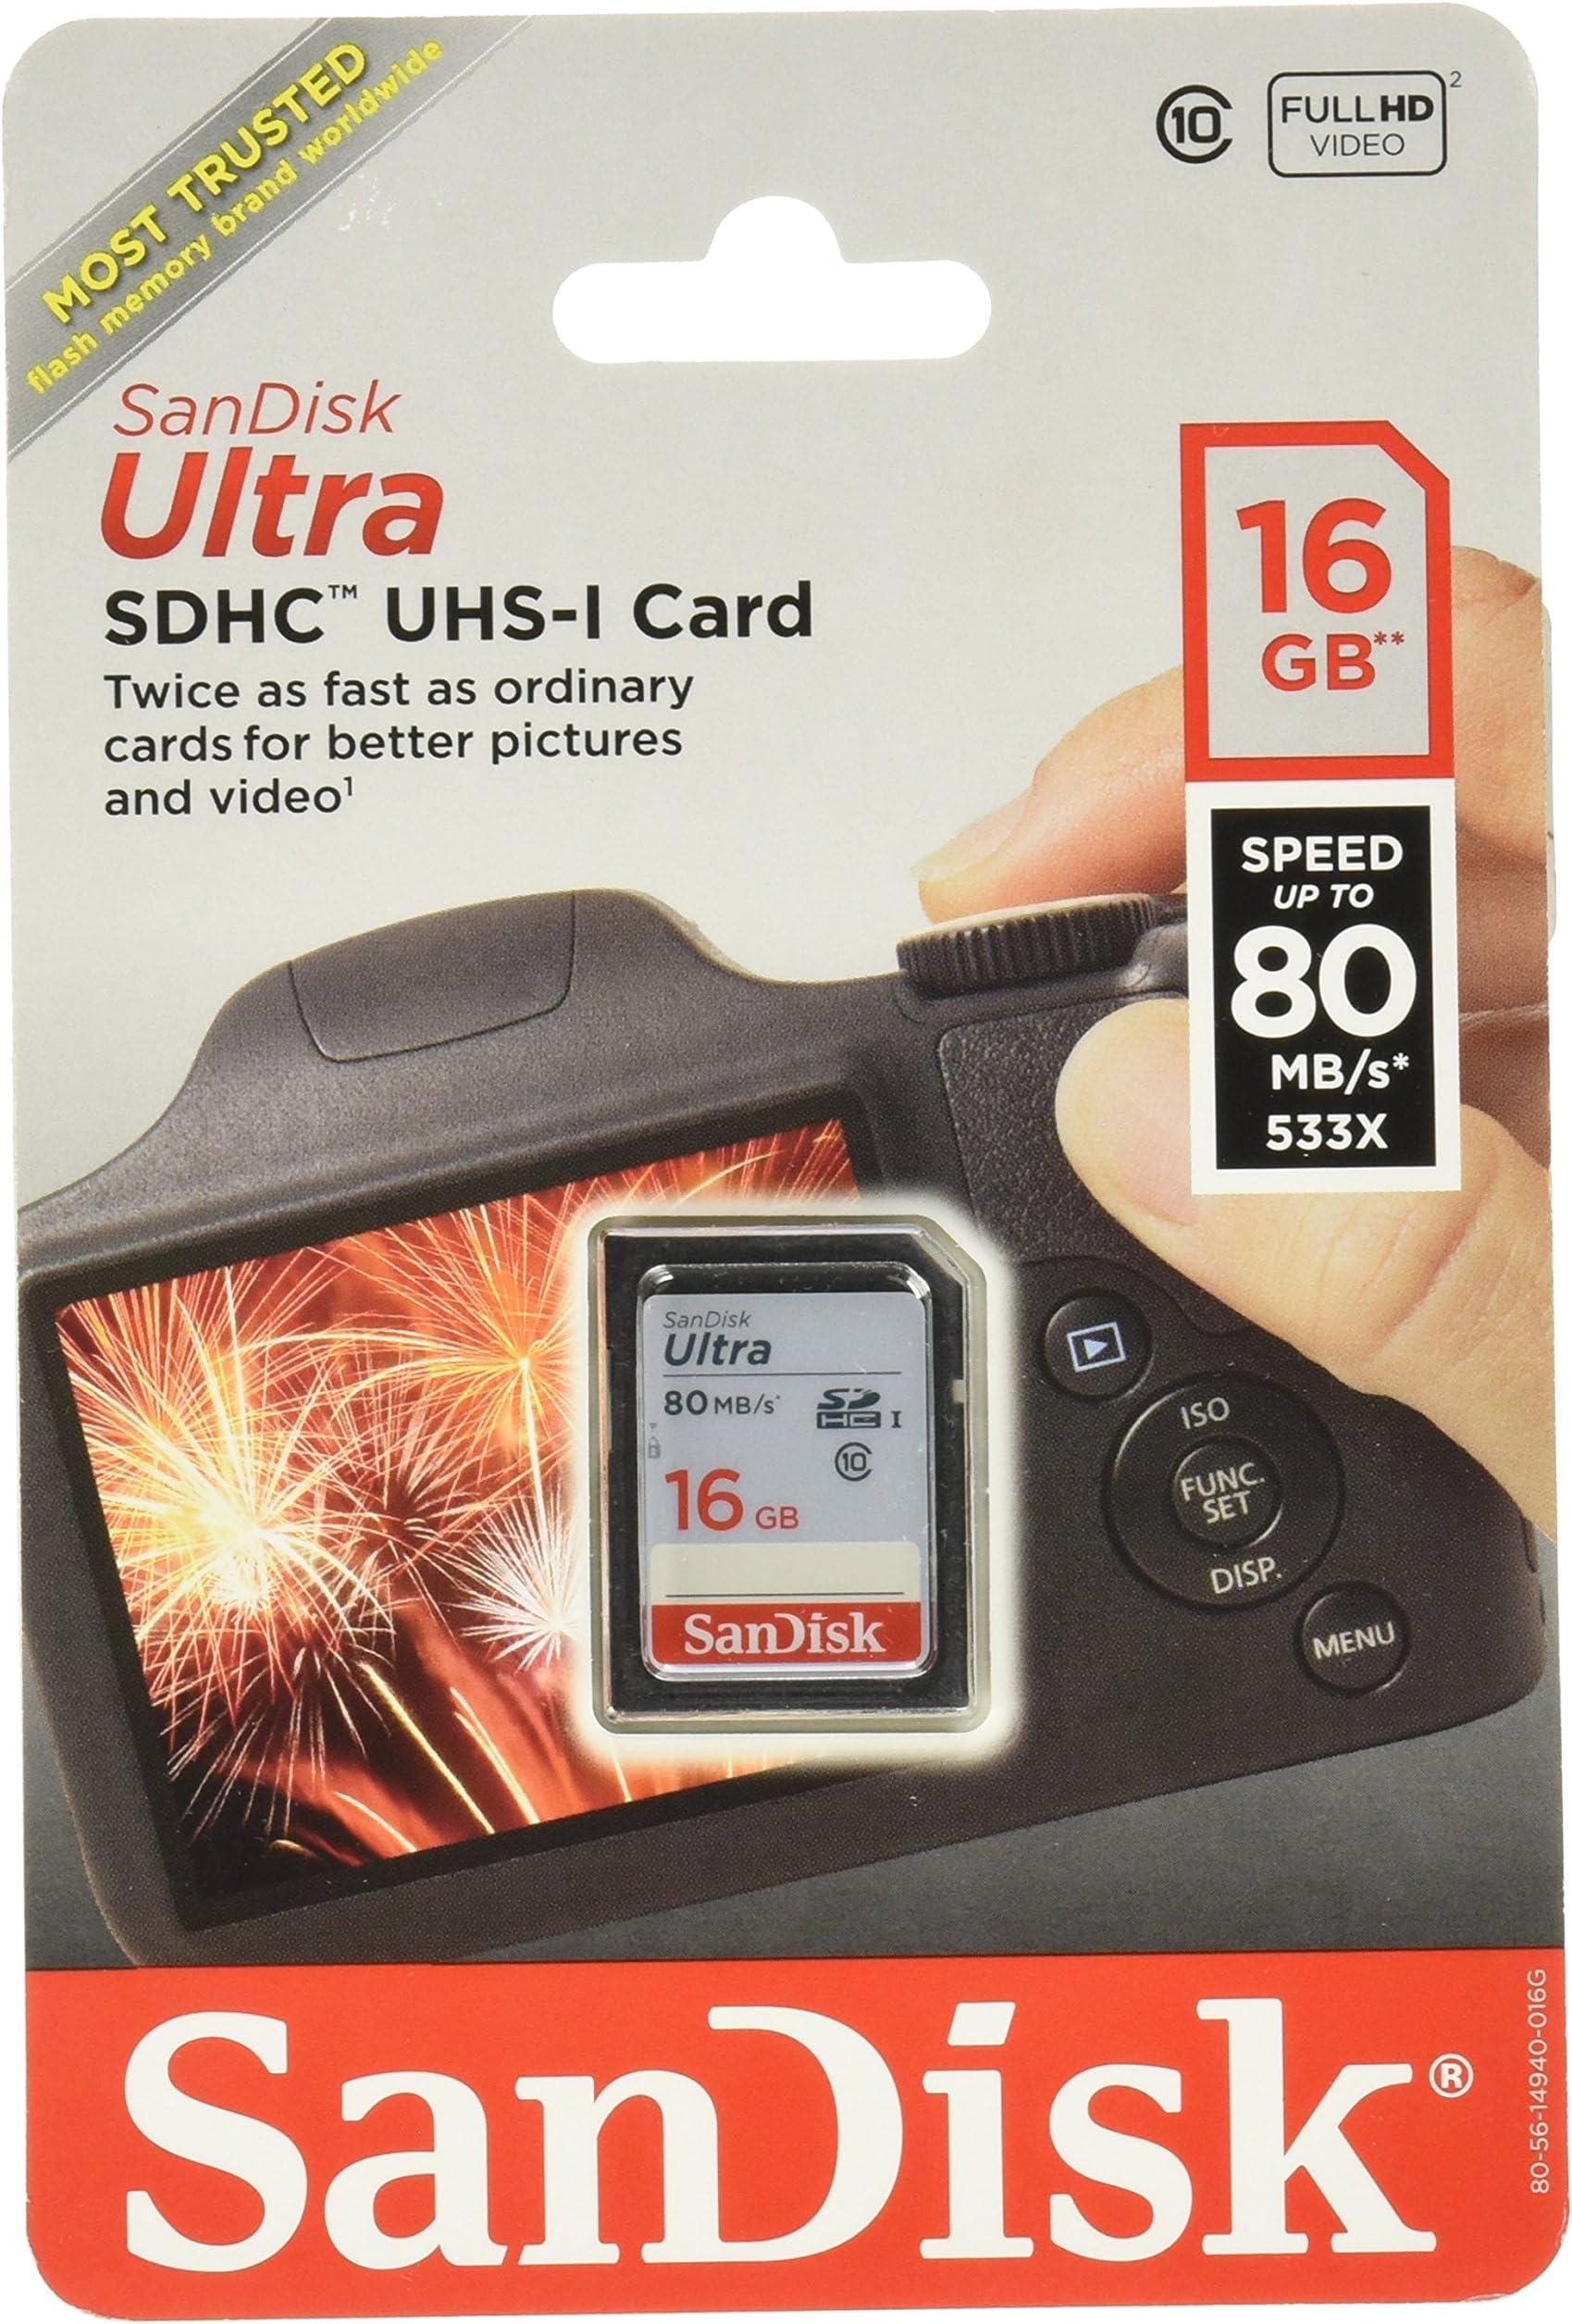 98MBs A1 U1 C10 Works with SanDisk Veri SanDisk Ultra 16GB MicroSDHC Works for ROKU Ultra by SanFlash